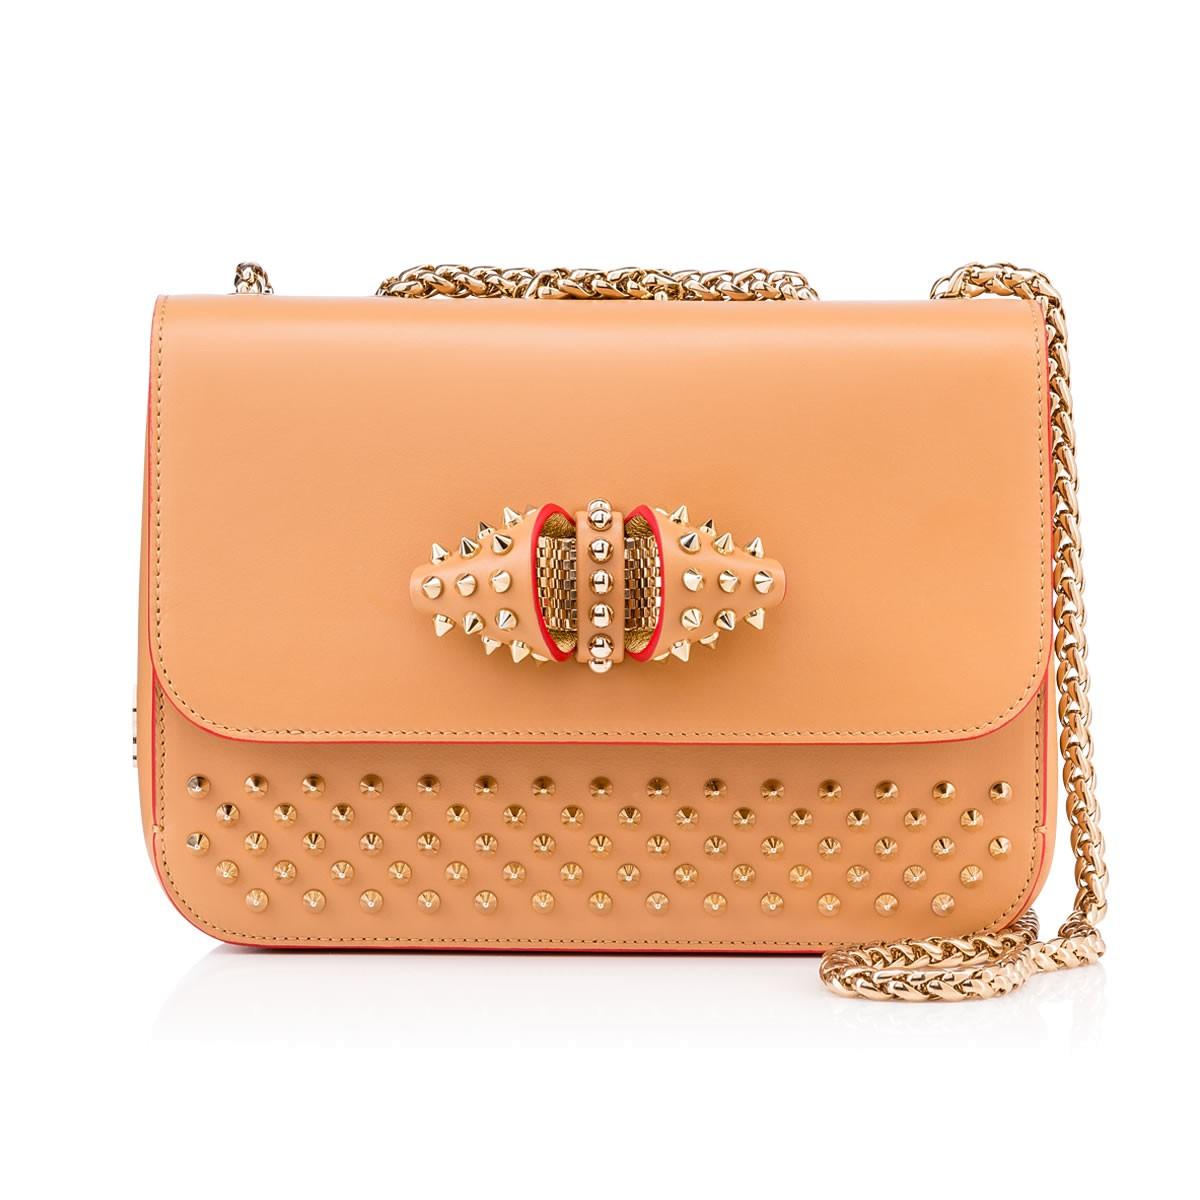 7516815a14d Sweet Charity Studded Calfskin Shoulder Bag, Biscuit